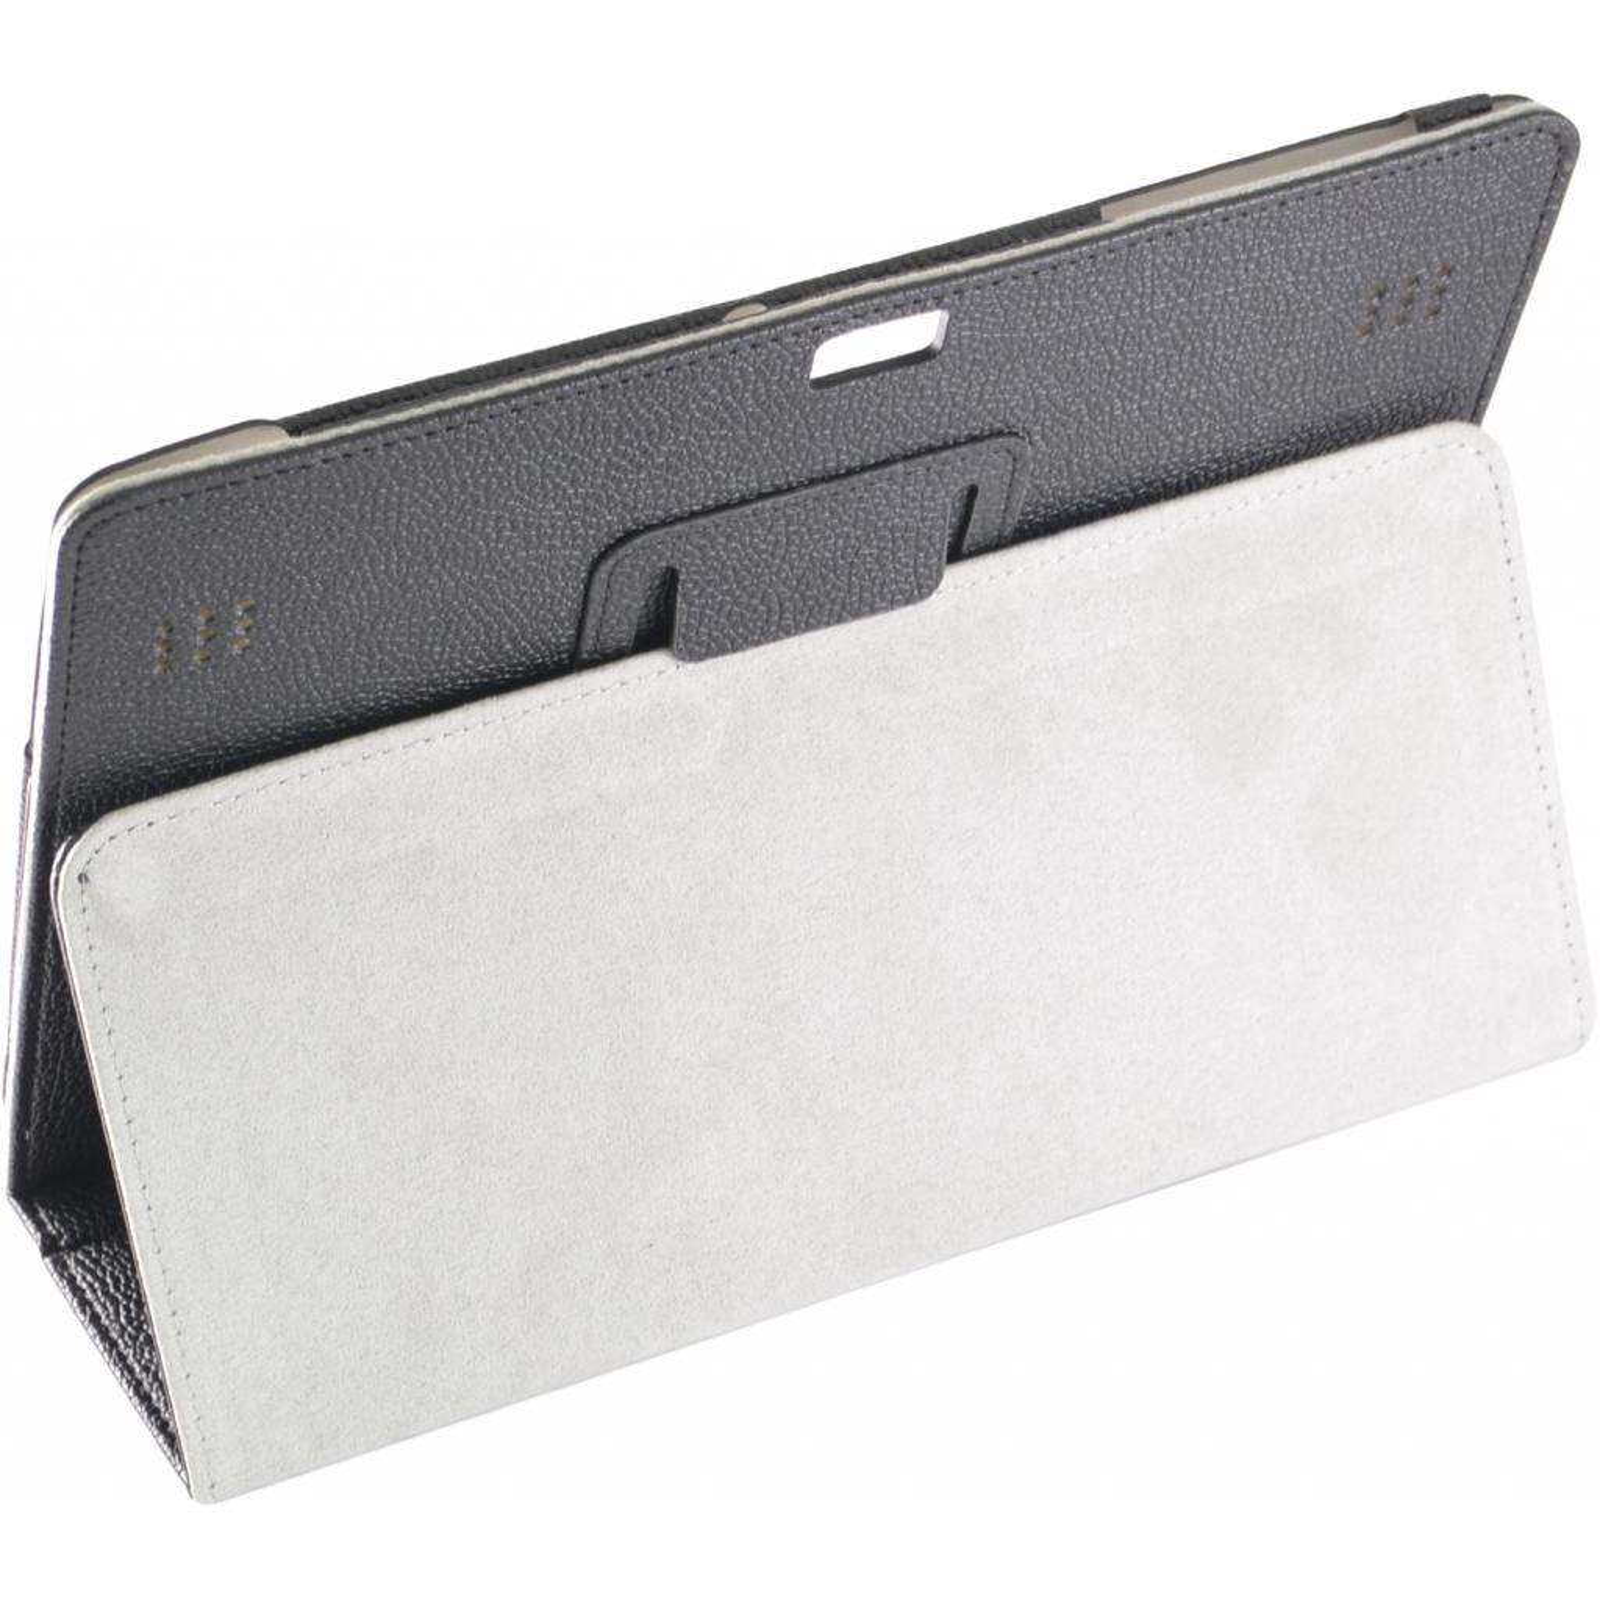 Чехол для планшета Pro-case Huawei MediaPad 10 Link S10-201u (HuawMP S10-201) изображение 4